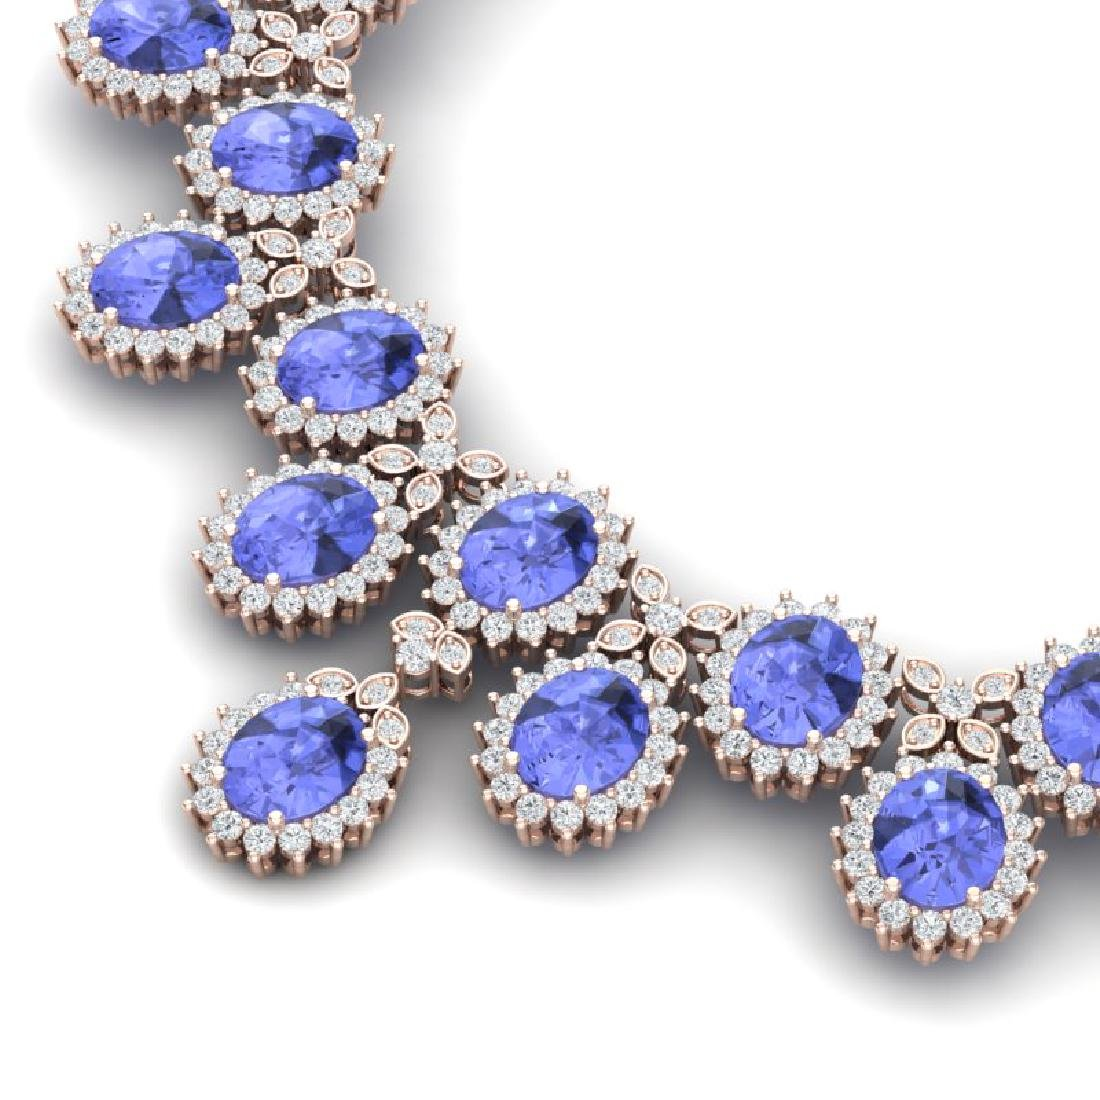 86 CTW Royalty Tanzanite & VS Diamond Necklace 18K Rose - 2